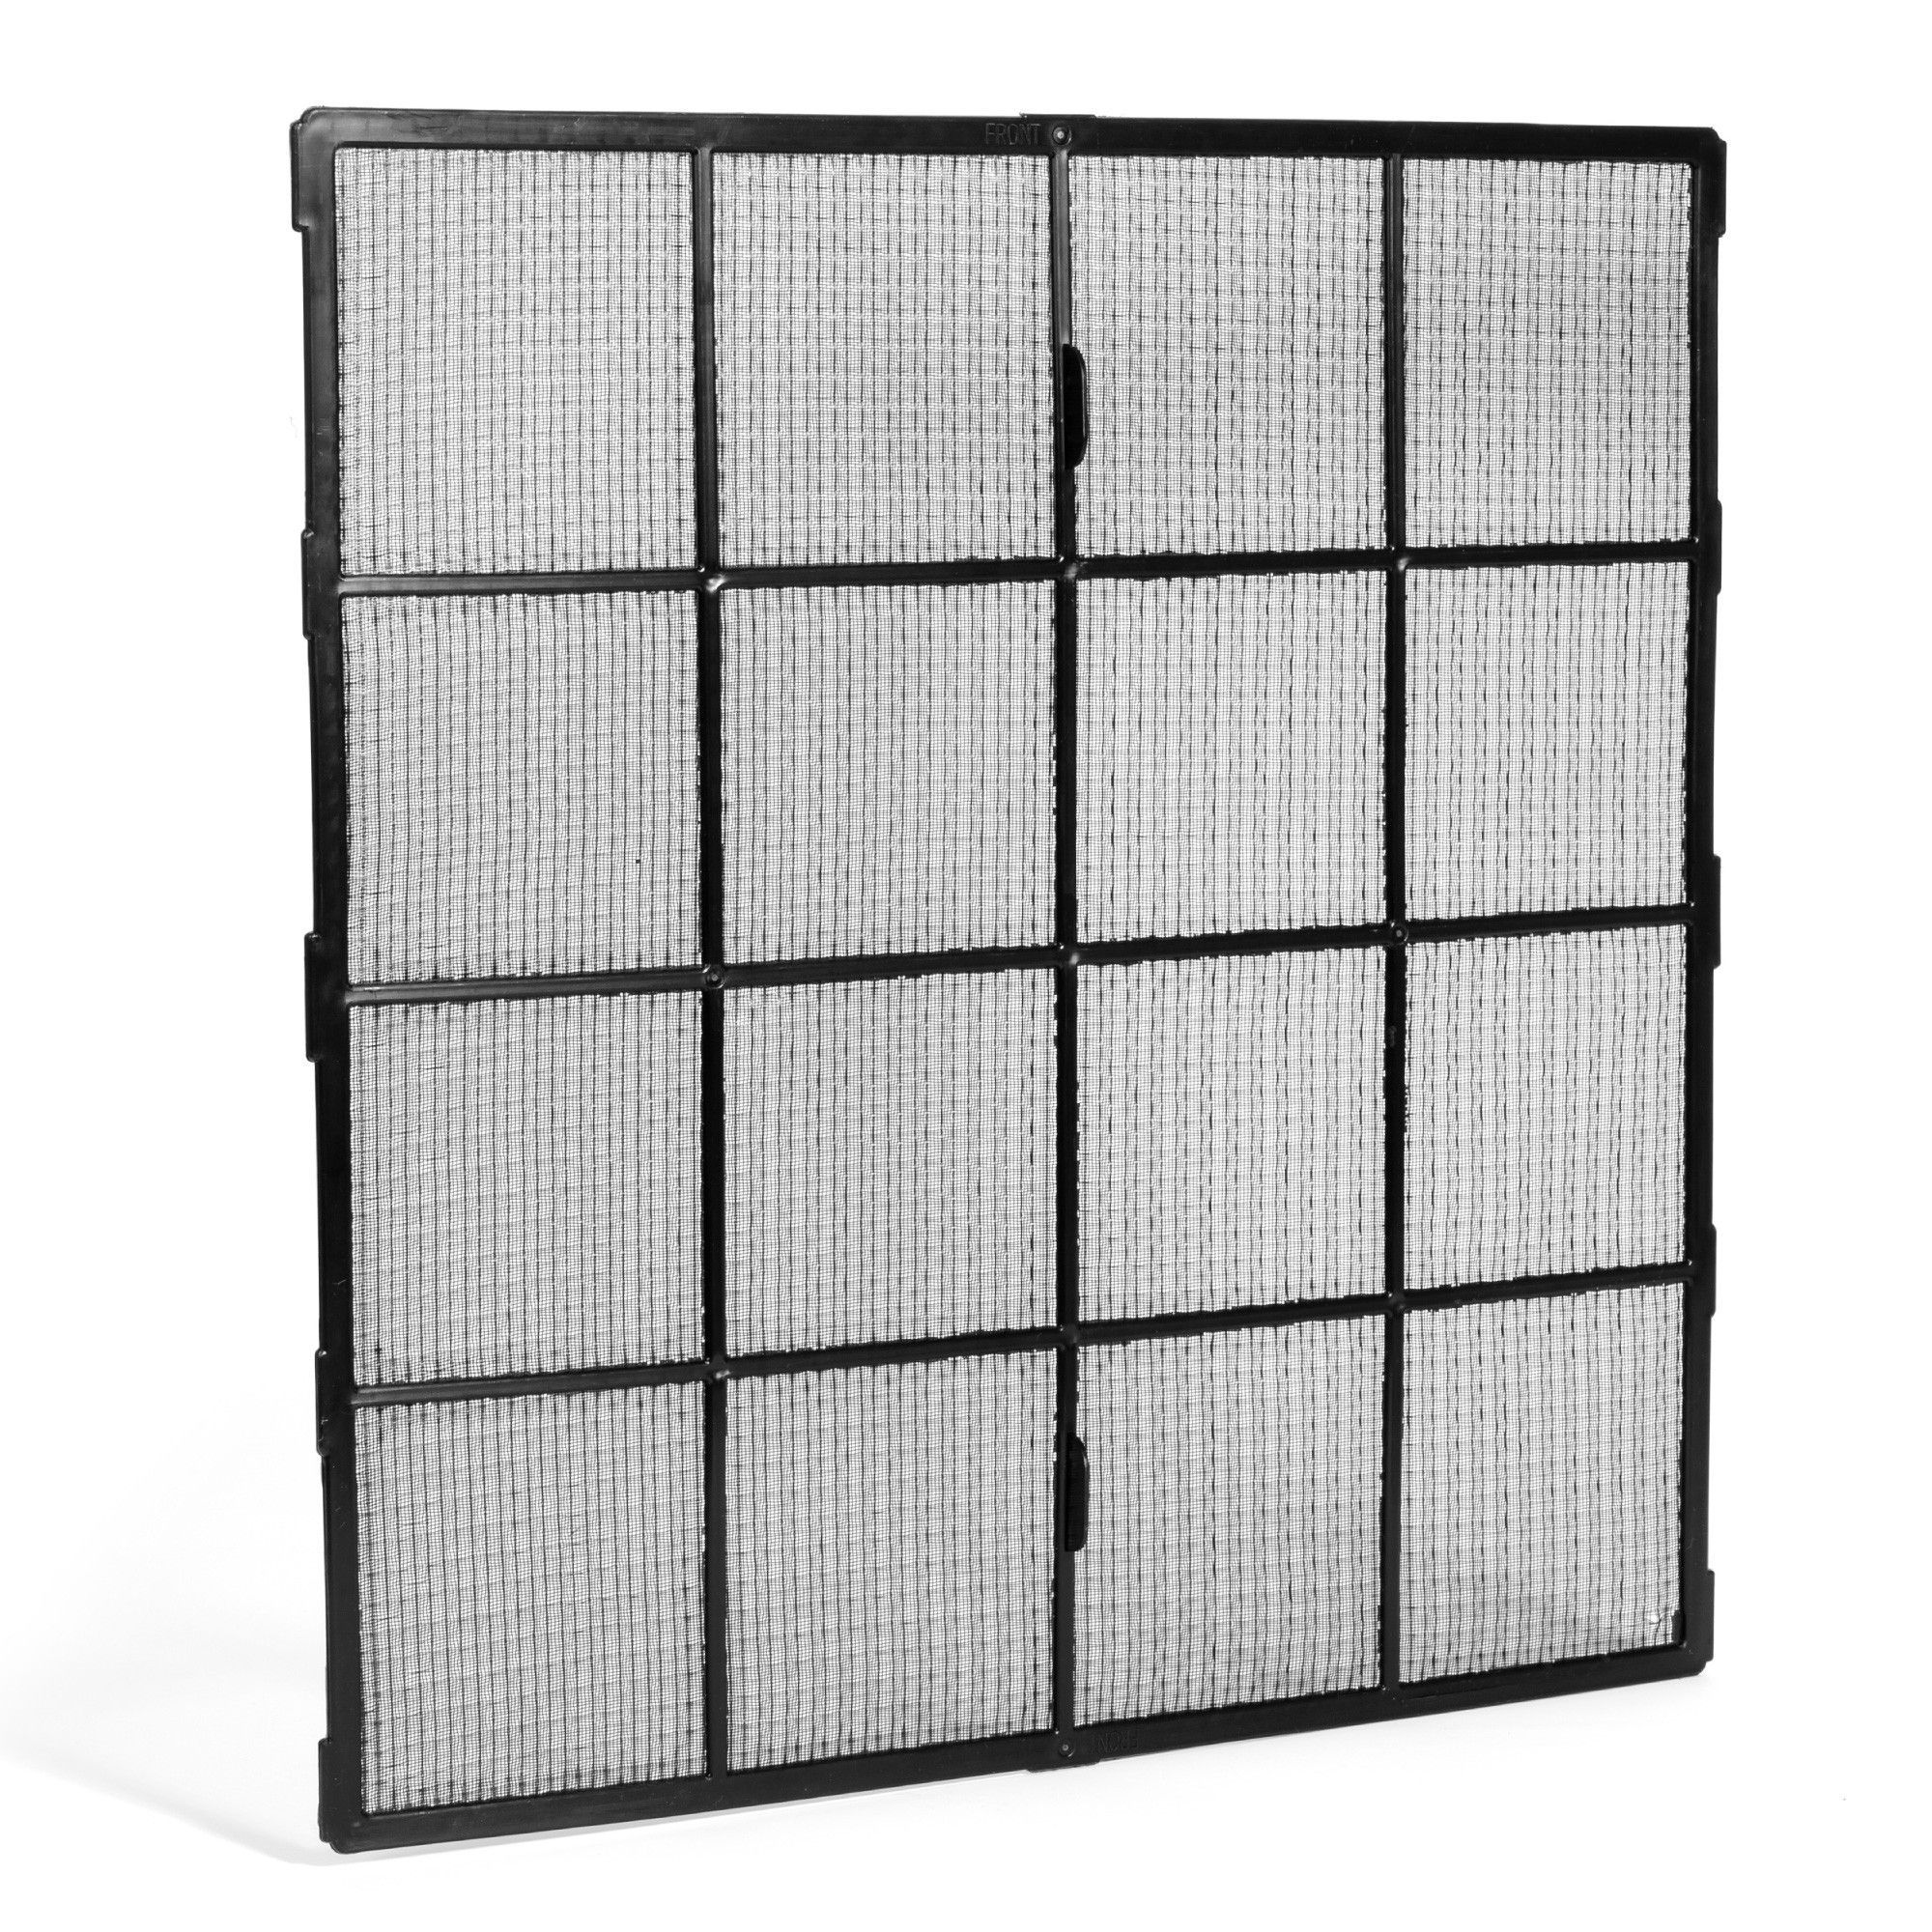 MinusA2 PreFilter Indoor air quality, Filters, Air purifier